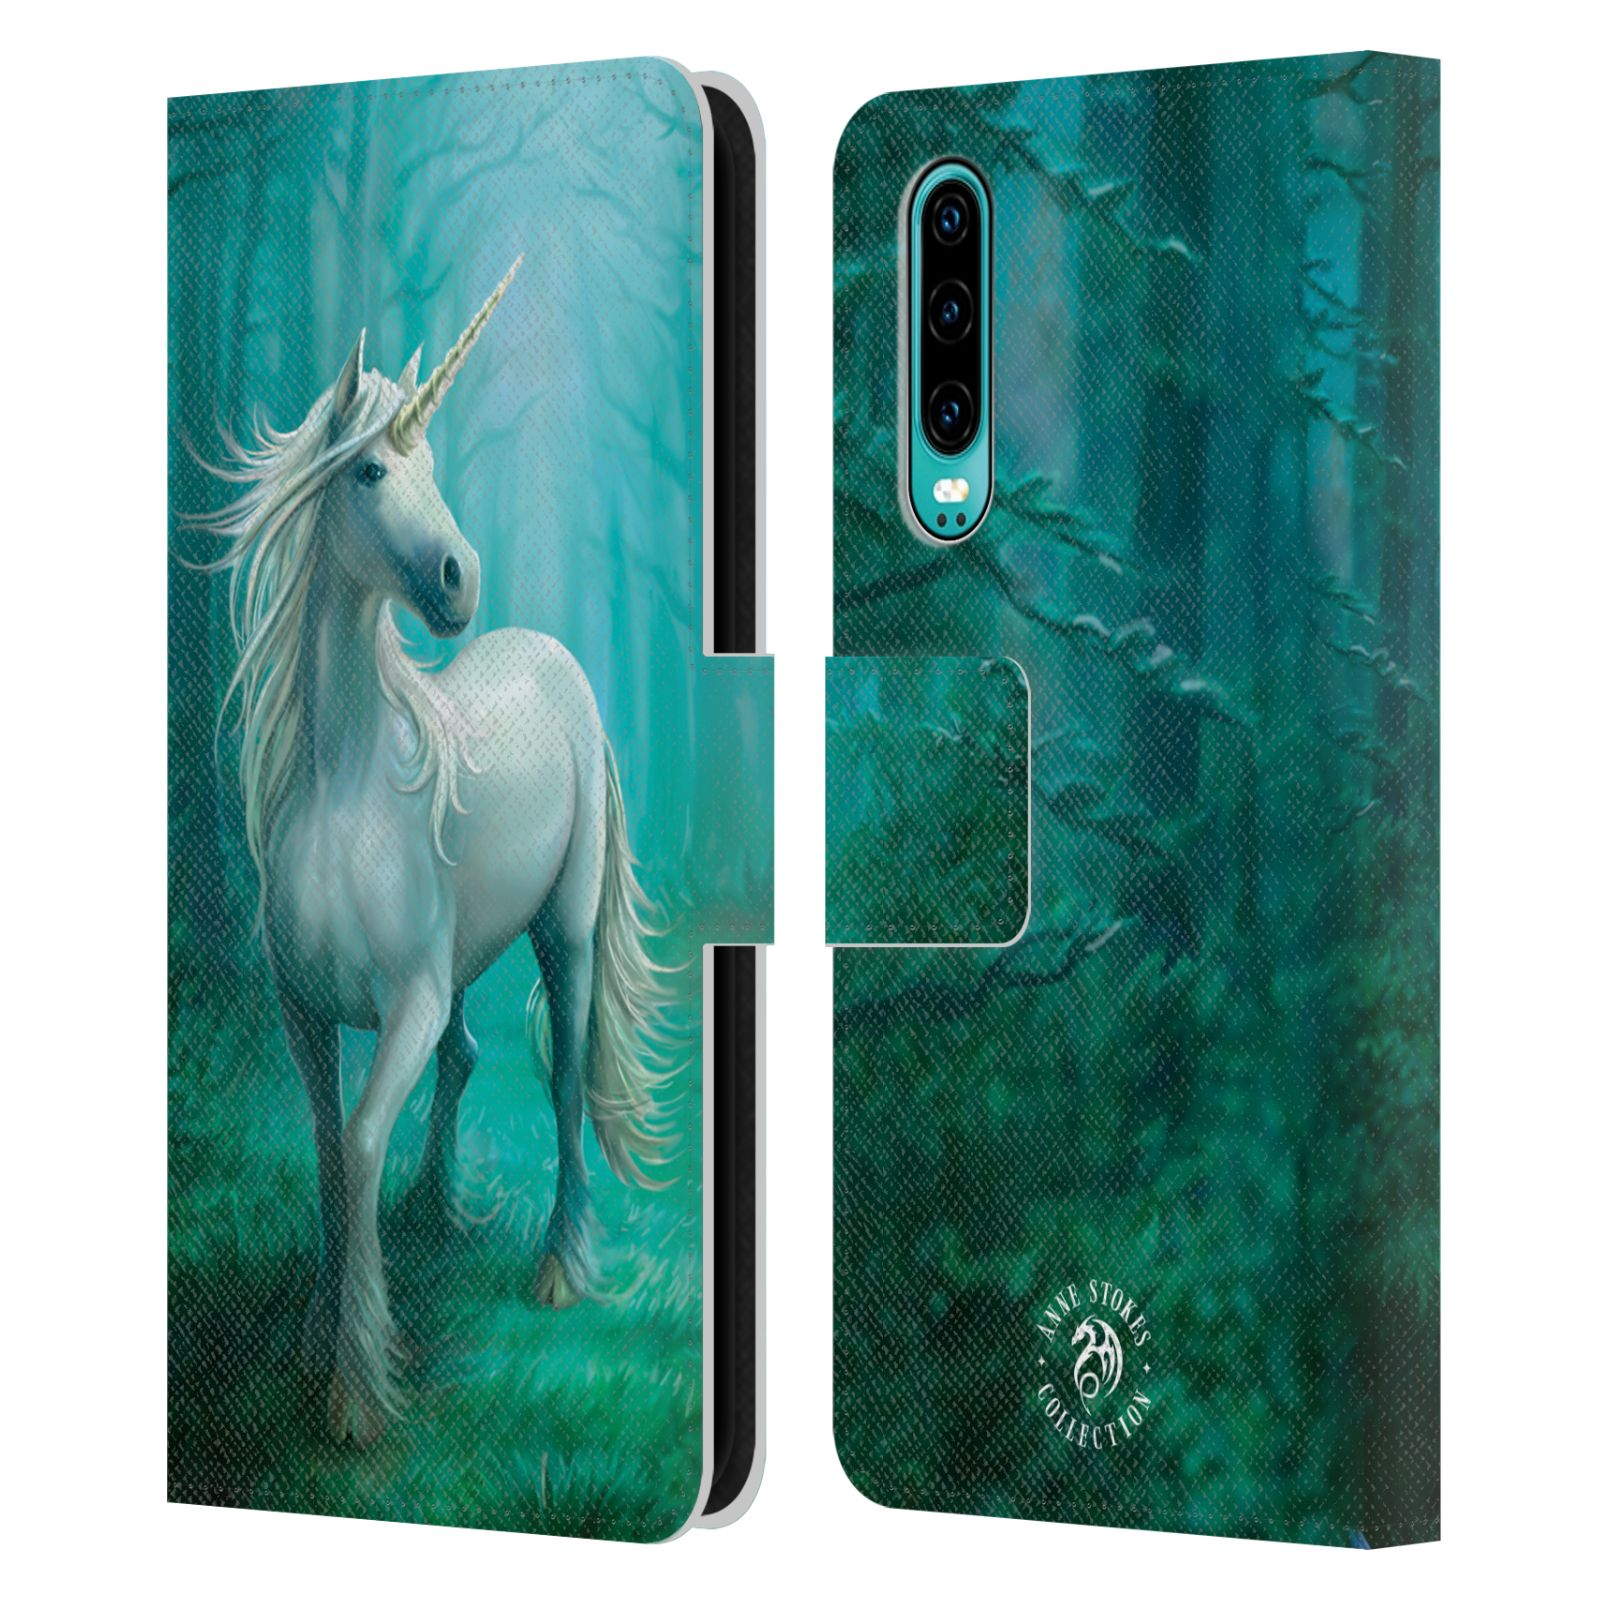 Pouzdro na mobil Huawei P30 - Head Case - fantasy - jednorožec v lese